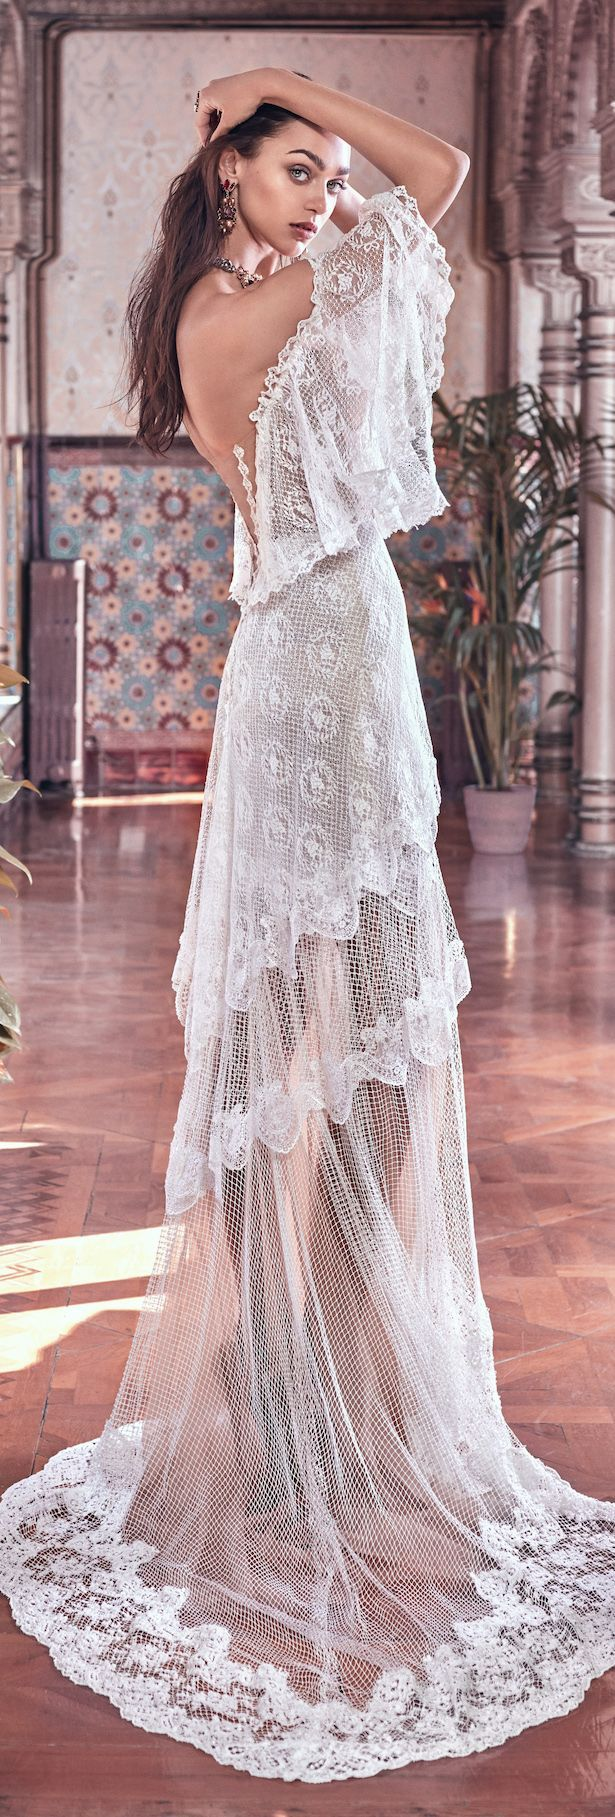 Elite wedding dresses  Galia Lahav Wedding Dress Collection  Victorian Affinity